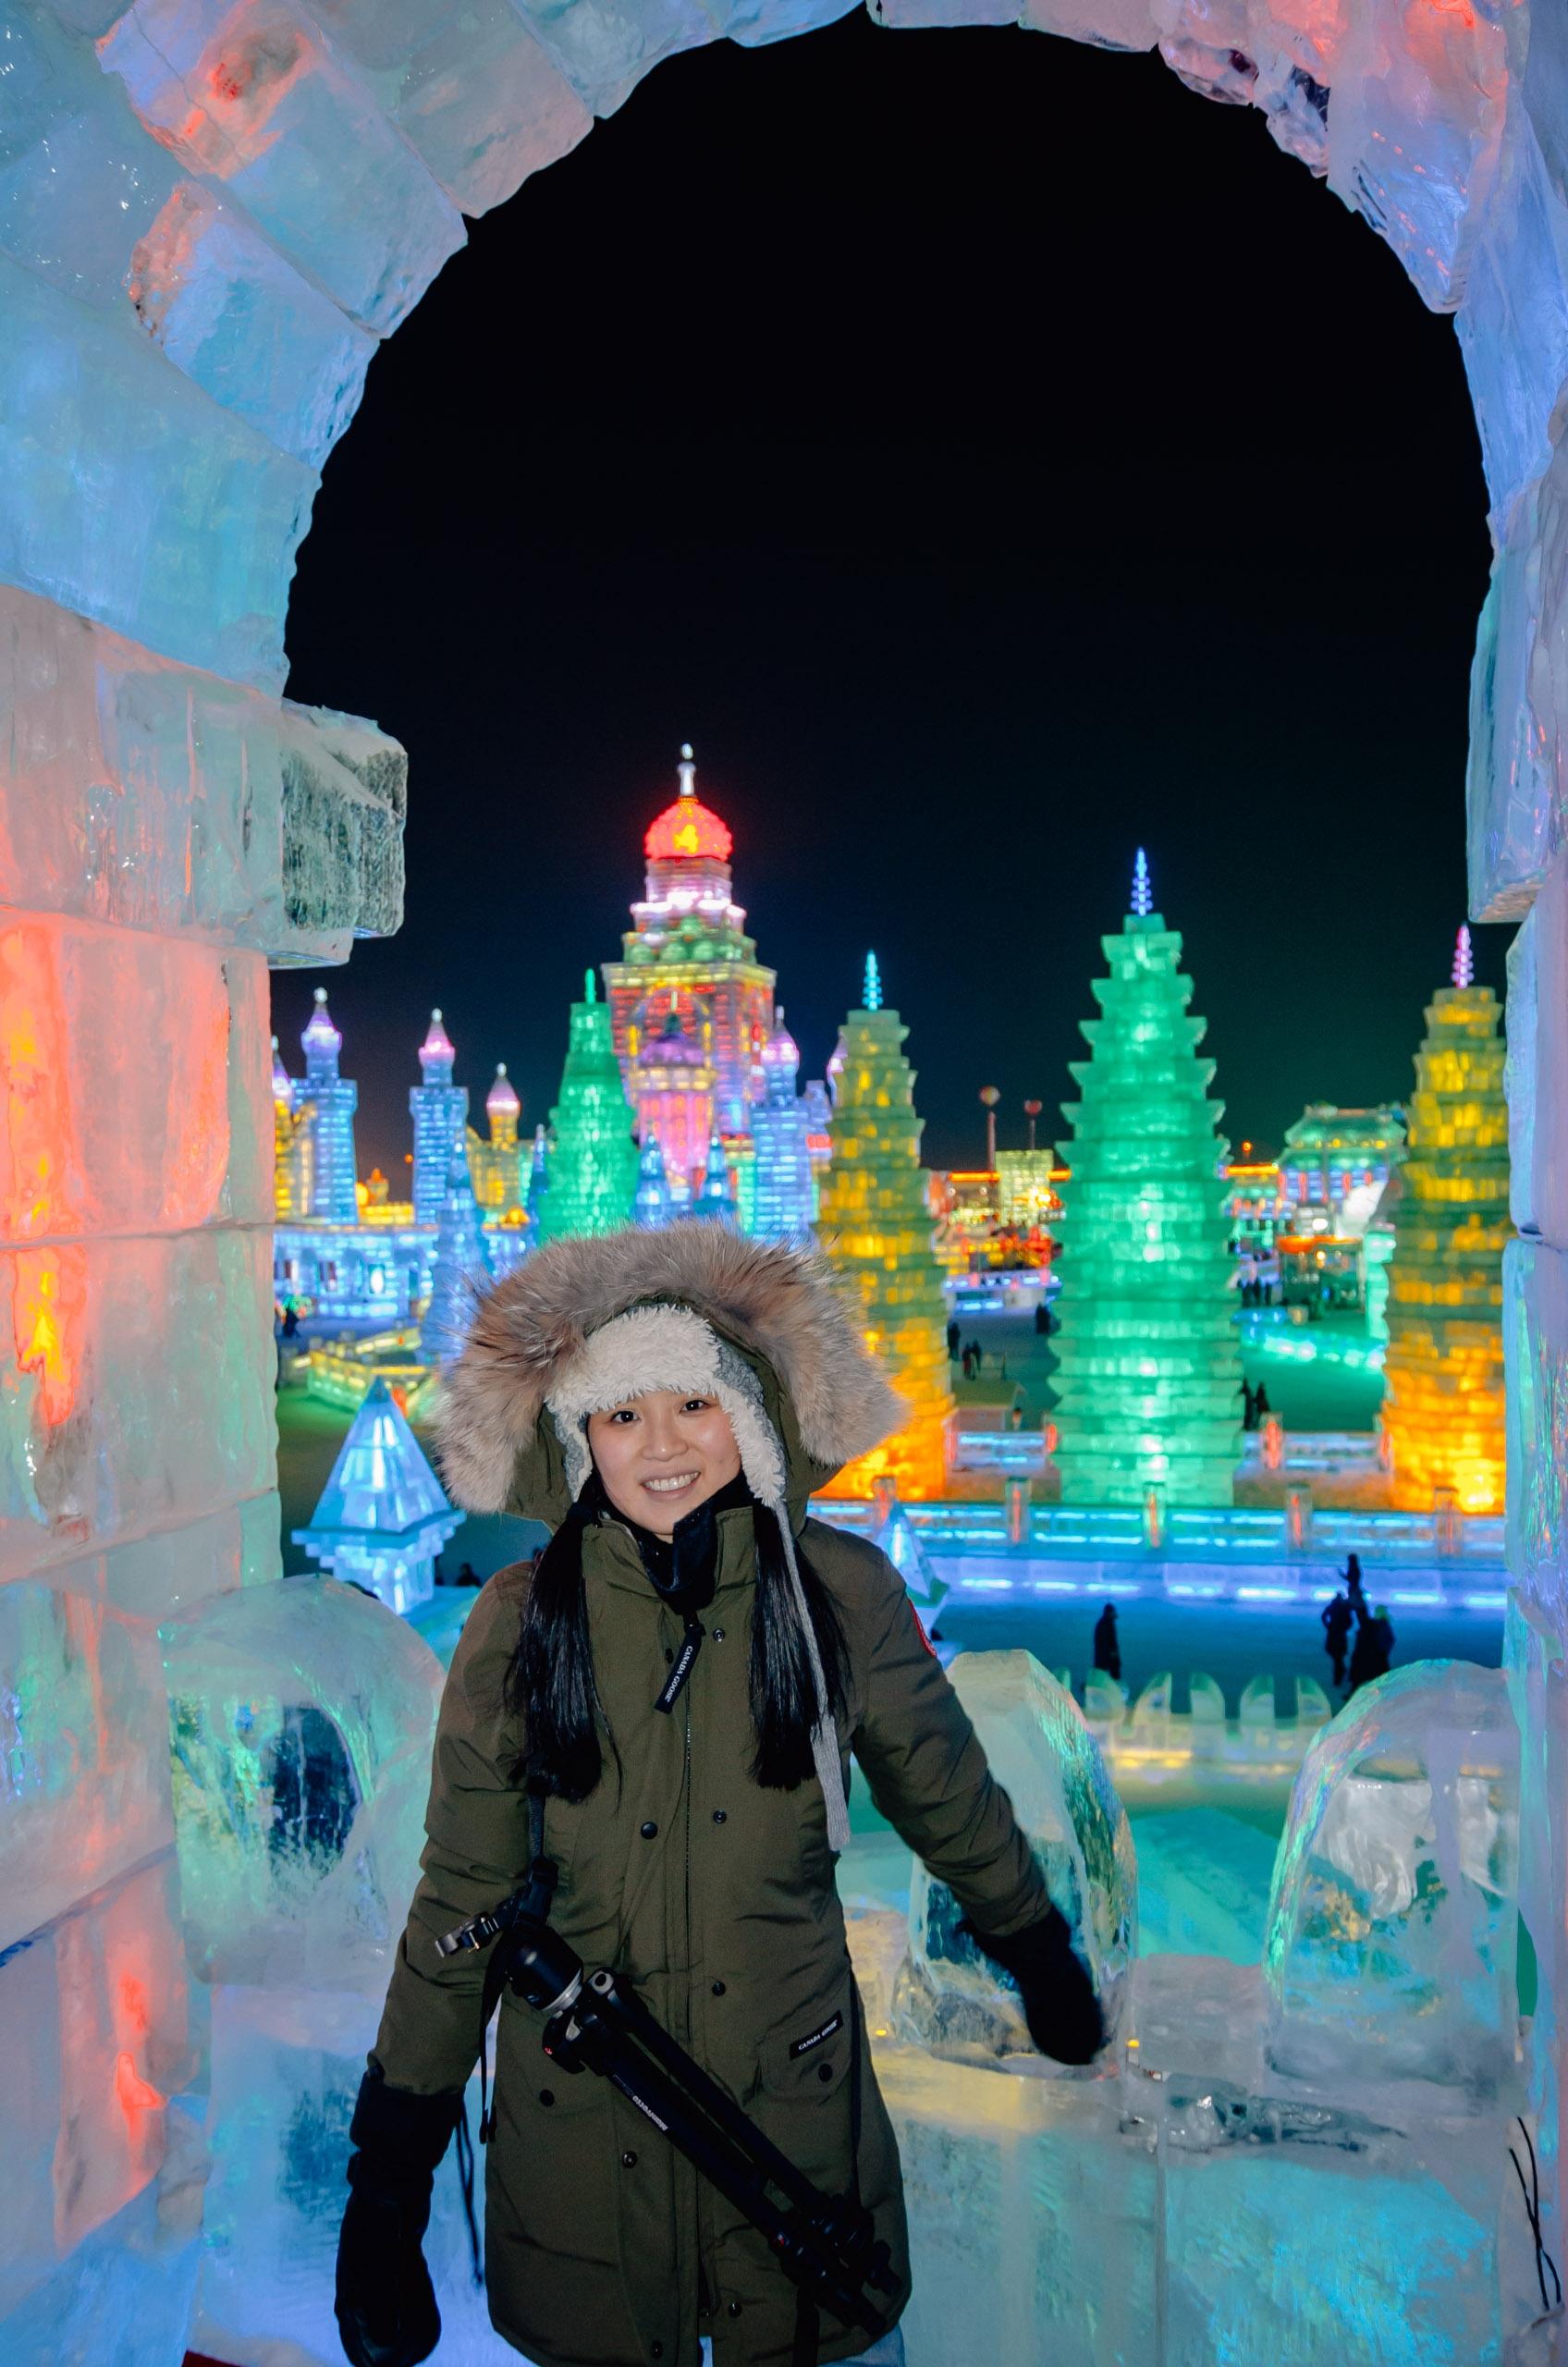 Harbin China Ice Festival - 2012-0108-DSC_2026